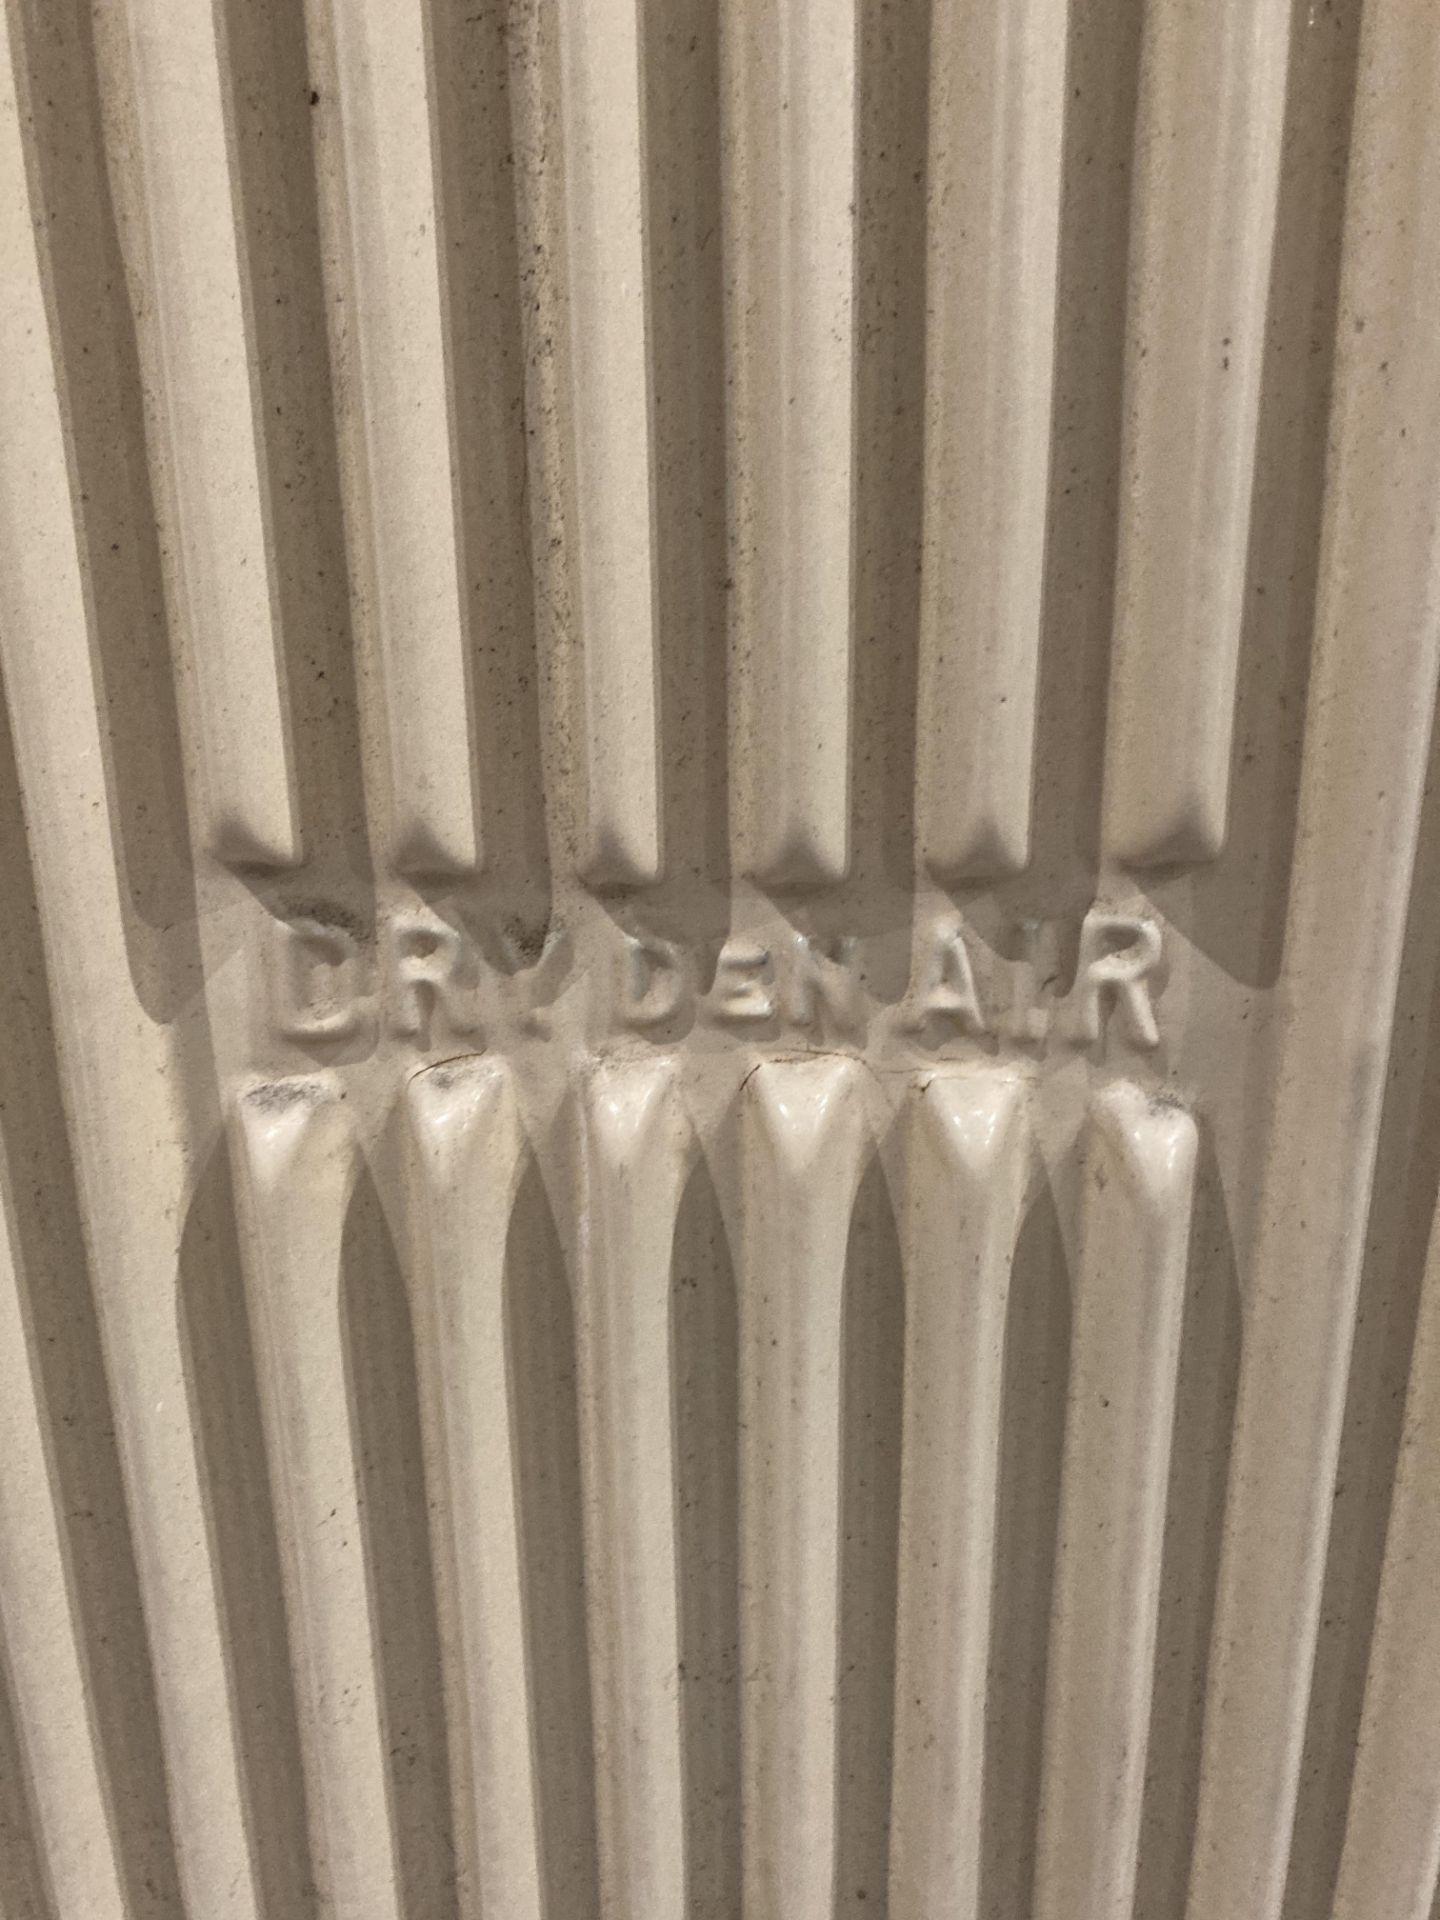 A Dry Denair cast iron mobile radiator 60 x 48cm wide - one cast castor broke off and electric - Image 2 of 5